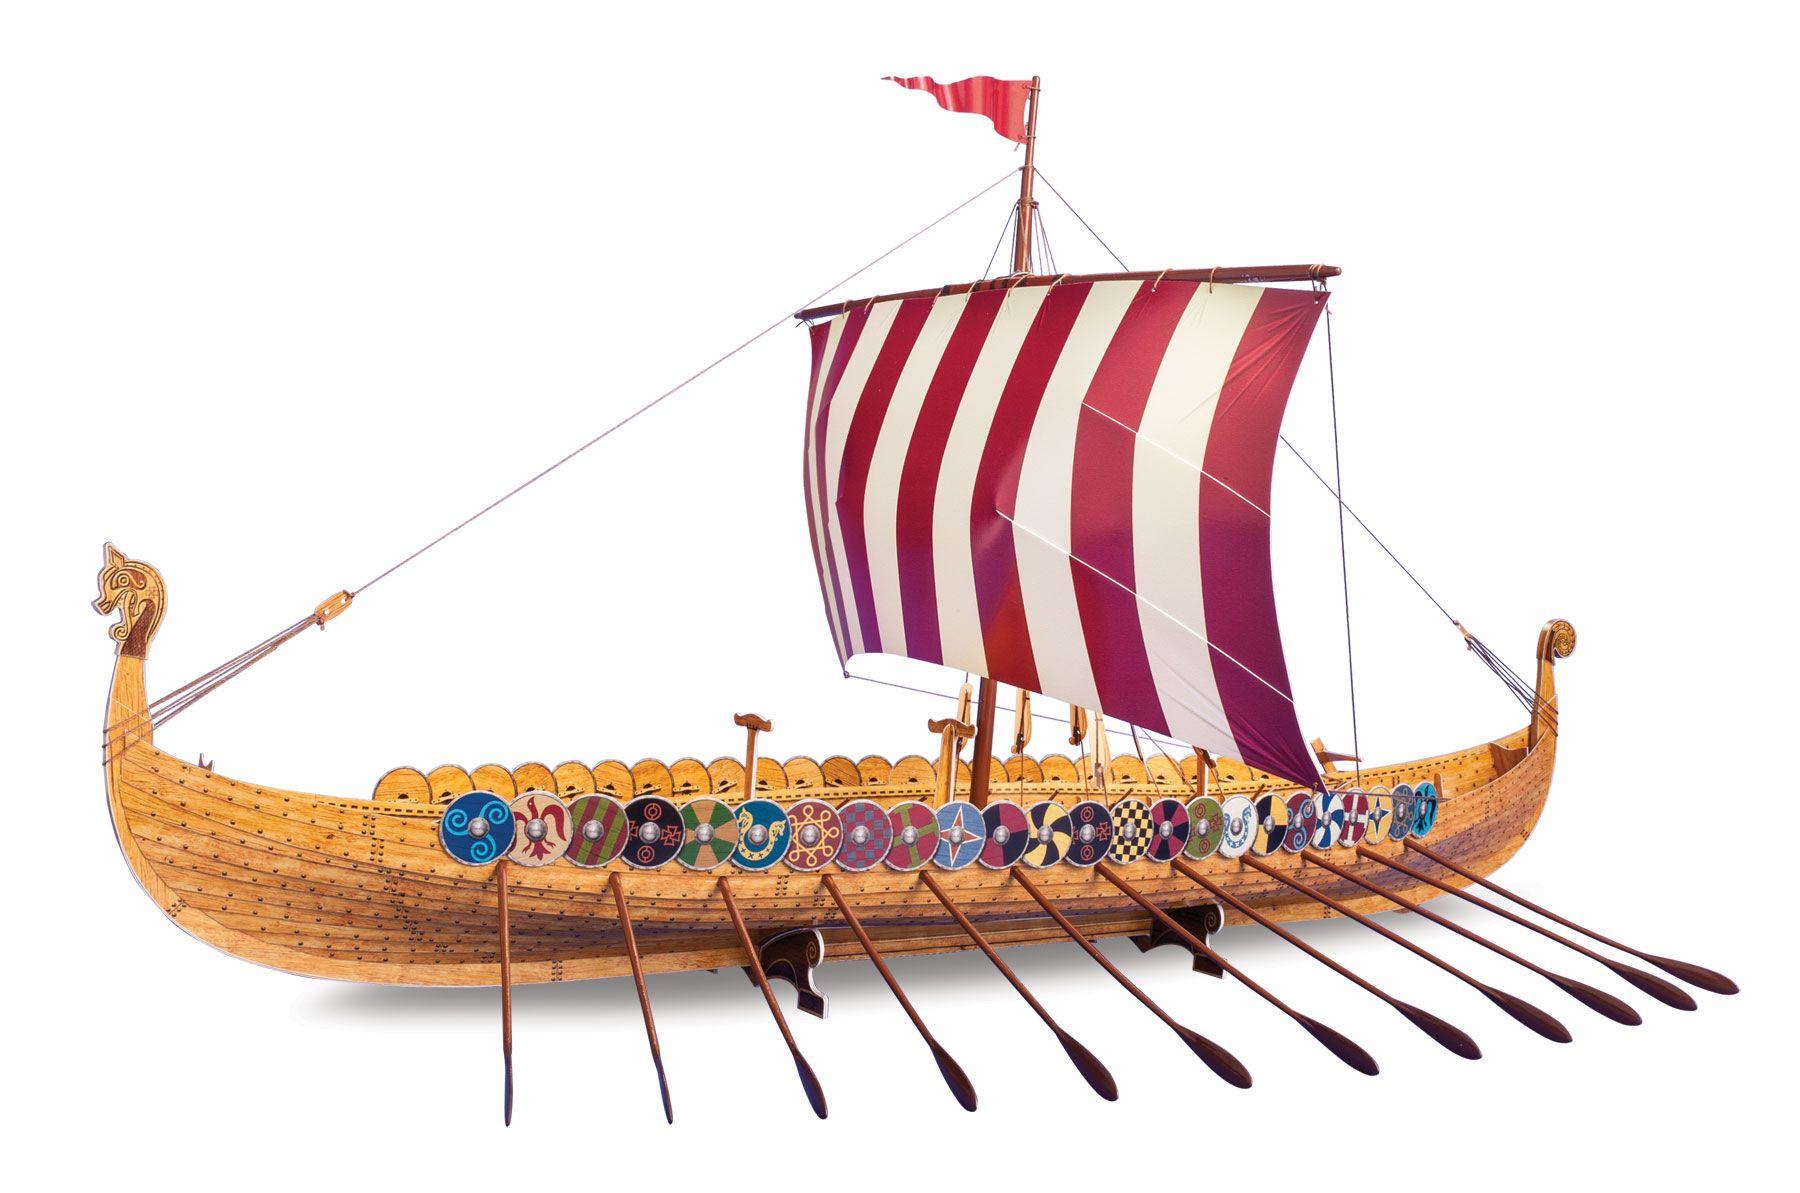 viking_ship - Google Search | Gingerbread | Pinterest